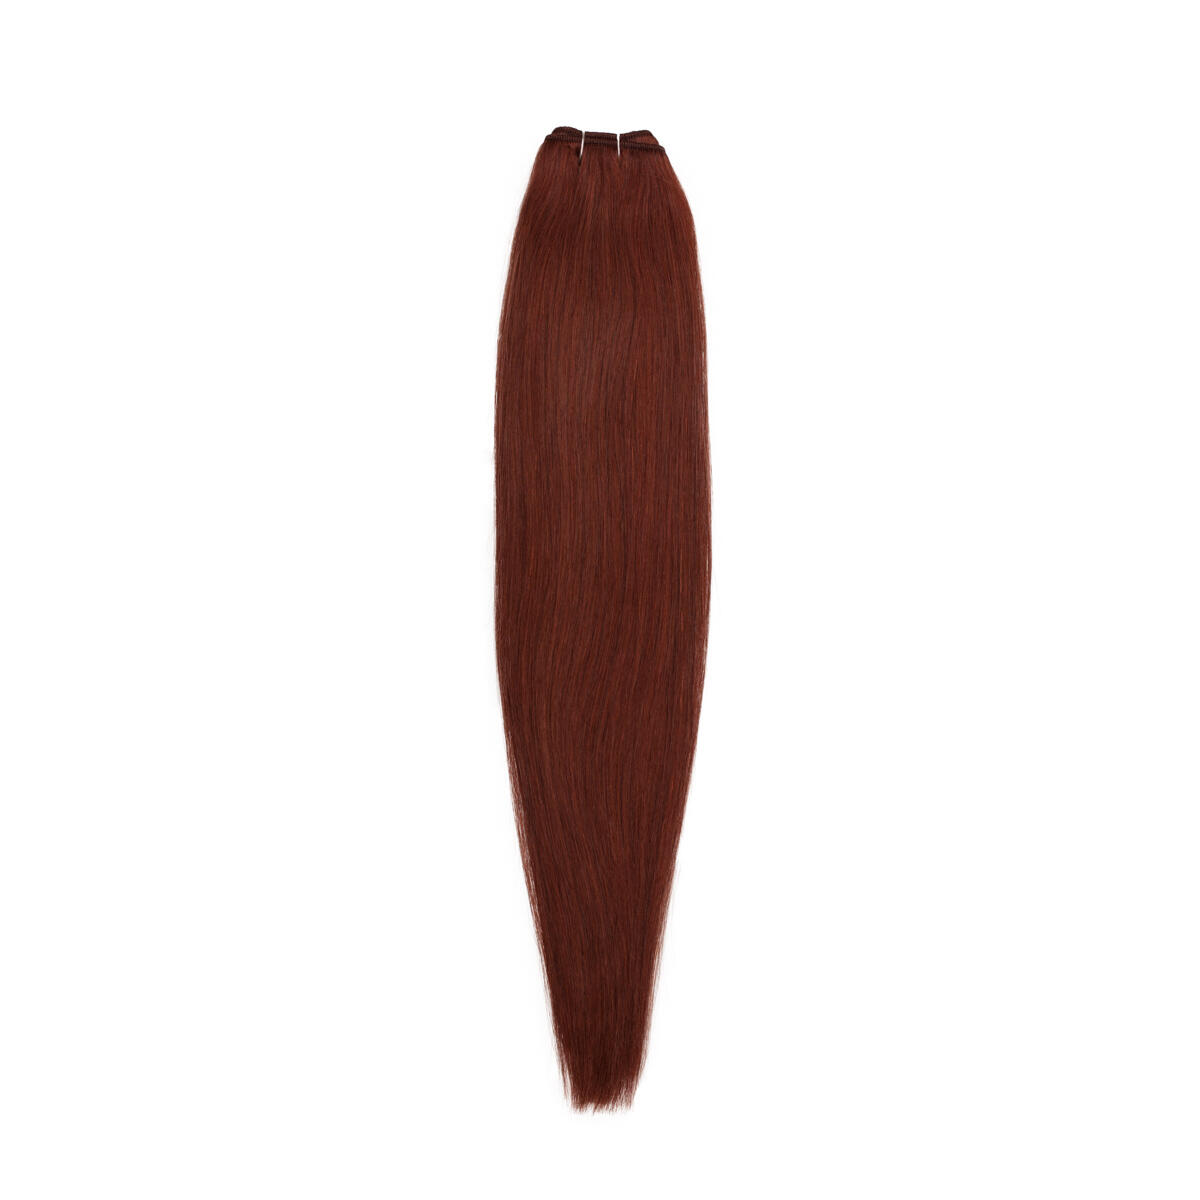 Hair Weft Premium 5.5 Mahogany Brown 50 cm